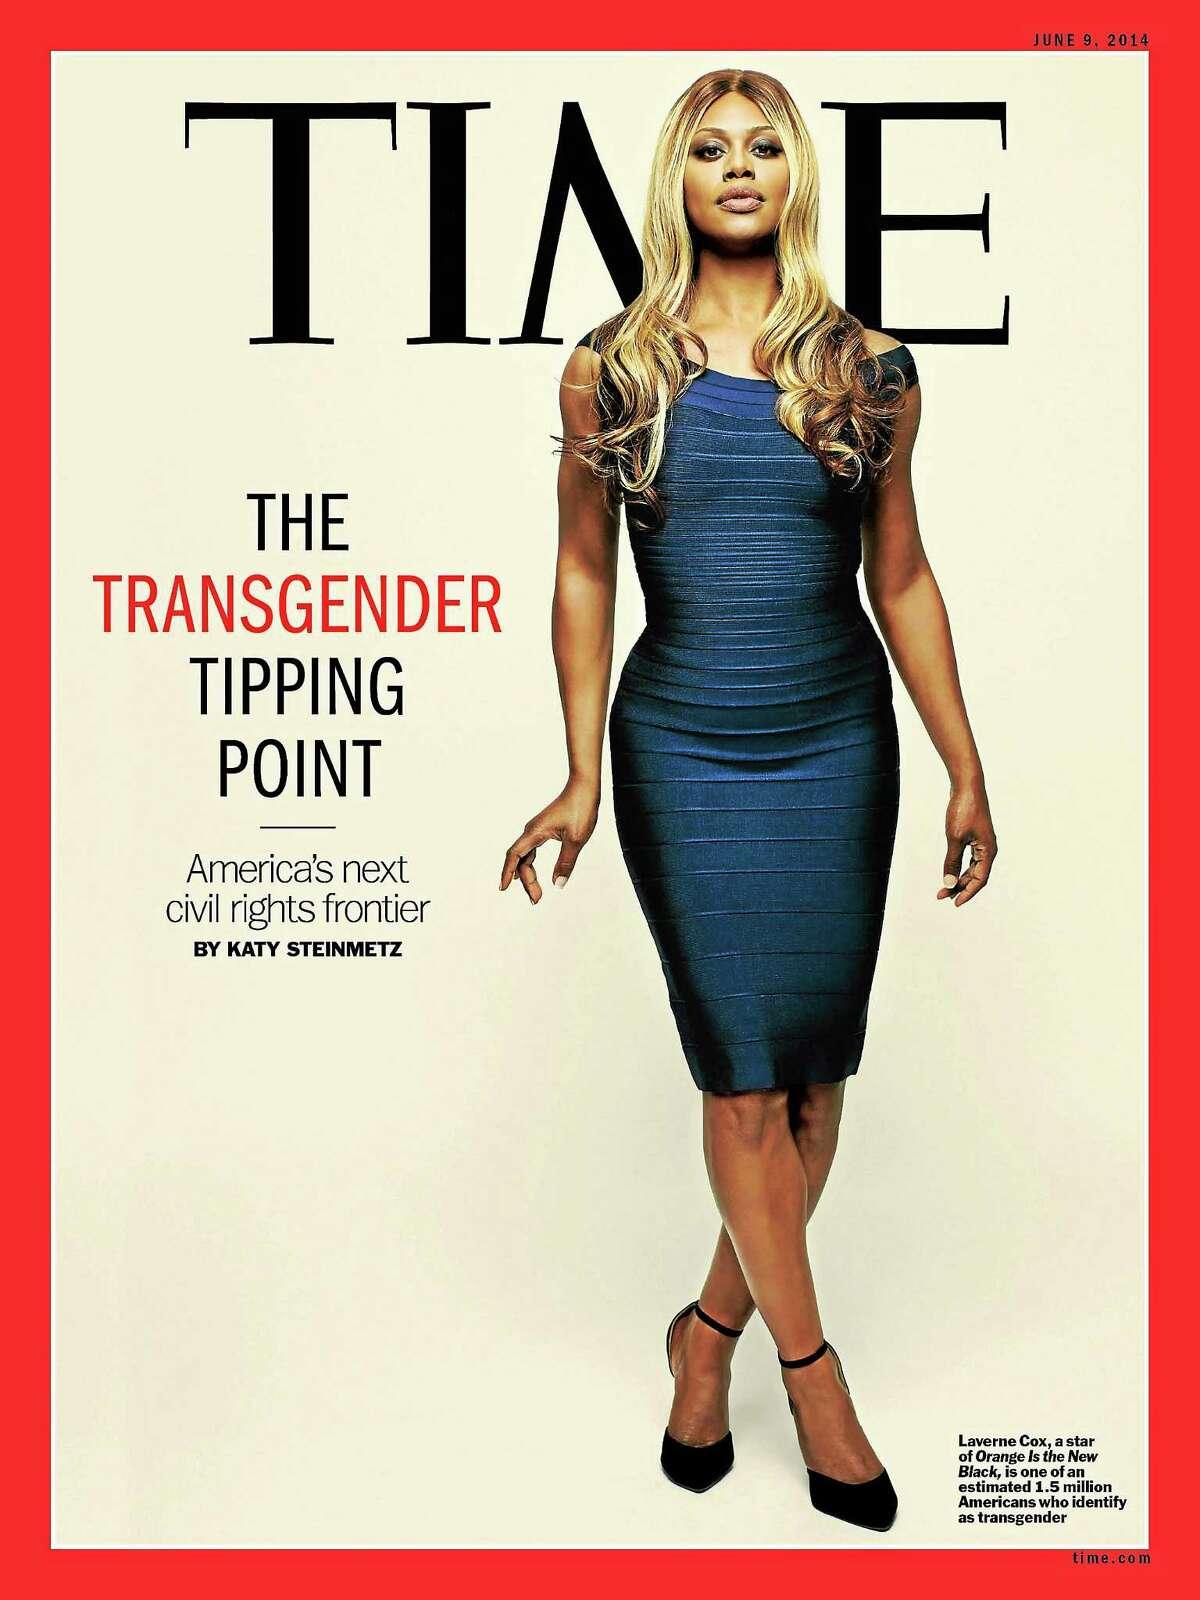 Editorial on transgender equality